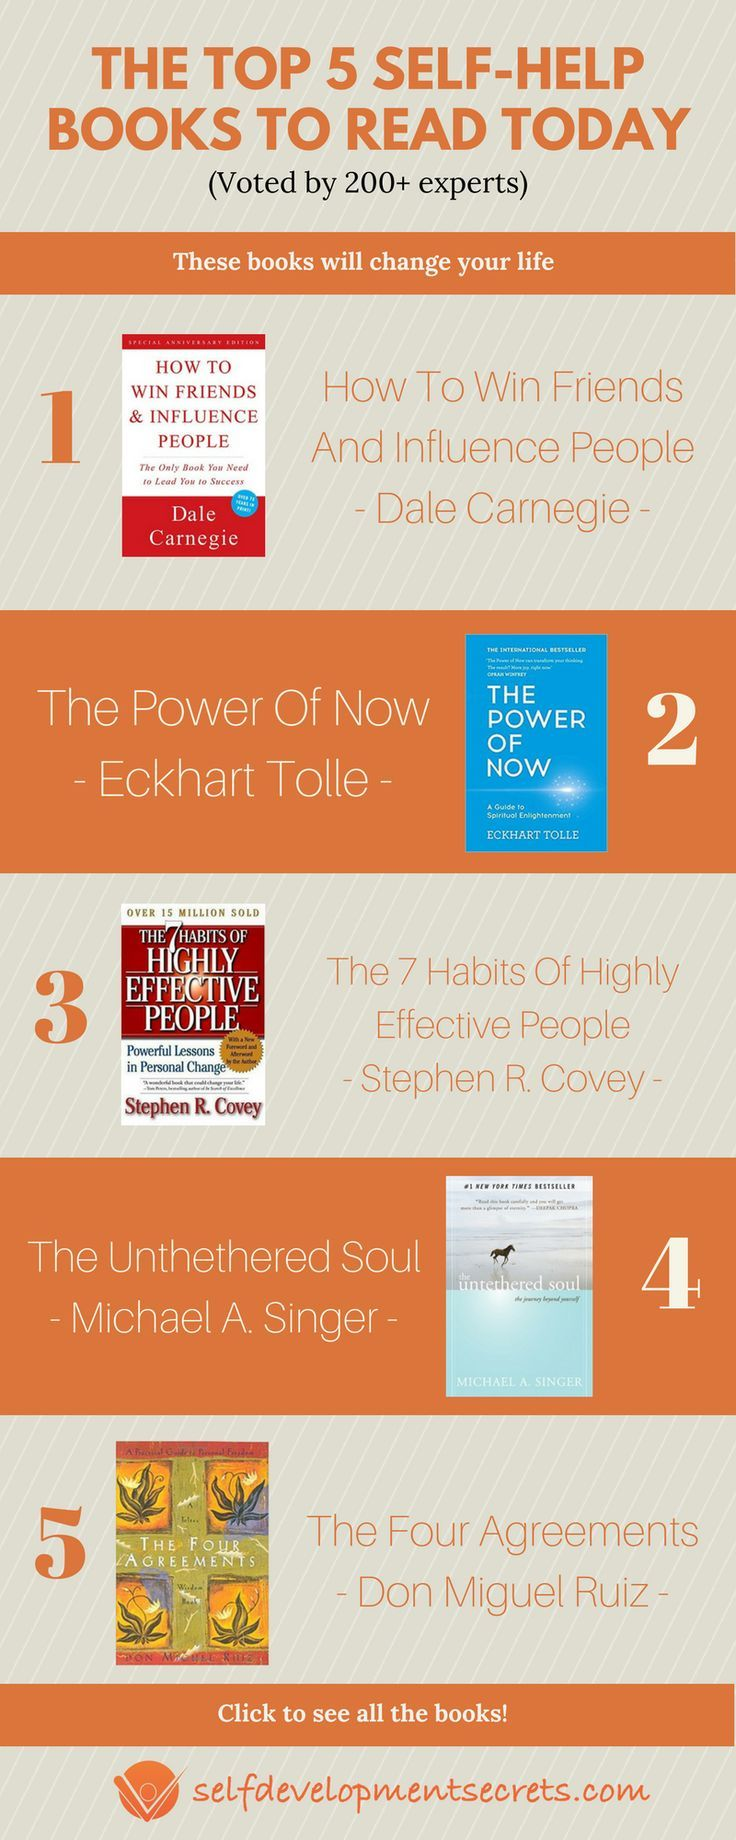 Here are the top 5 self help books you should read today! #selfhelpbooks #selfhelp #selfimprovementbooks #selfdevelopmentbooks #selfdevelopment #PersonalDevelopmentMentor